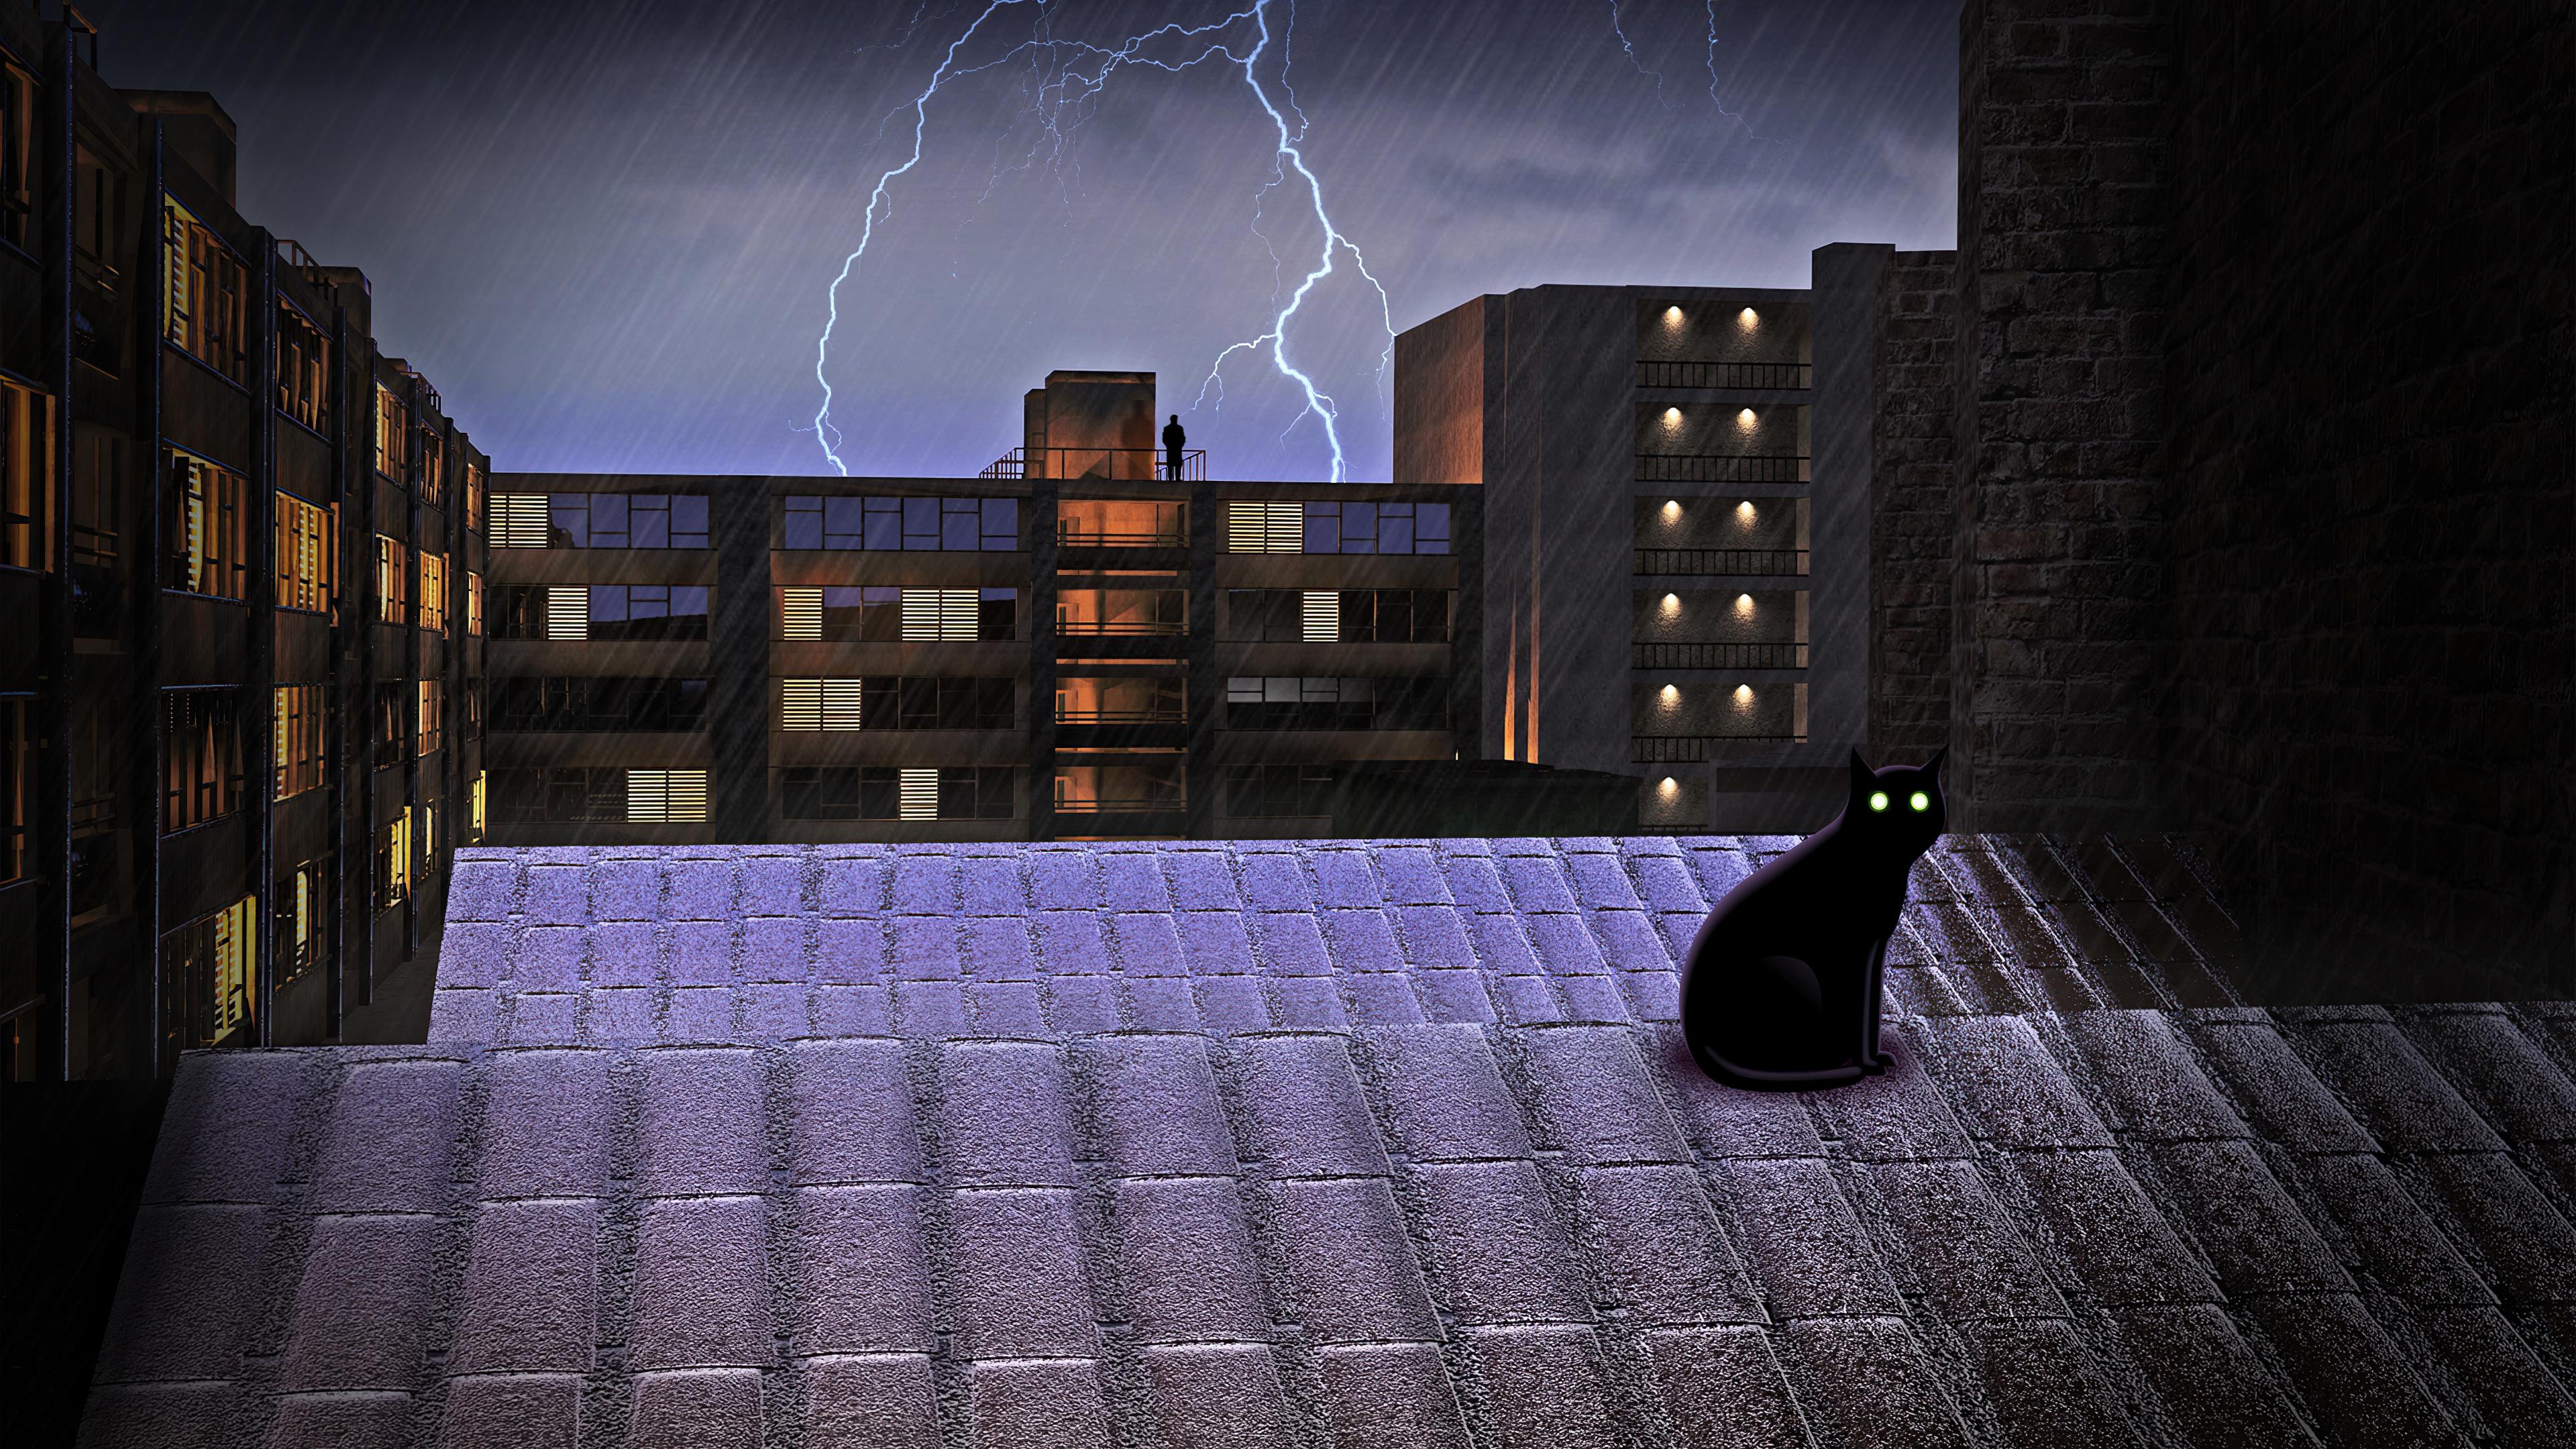 black-cat-on-rooftop-lightning-4k-kp.jpg